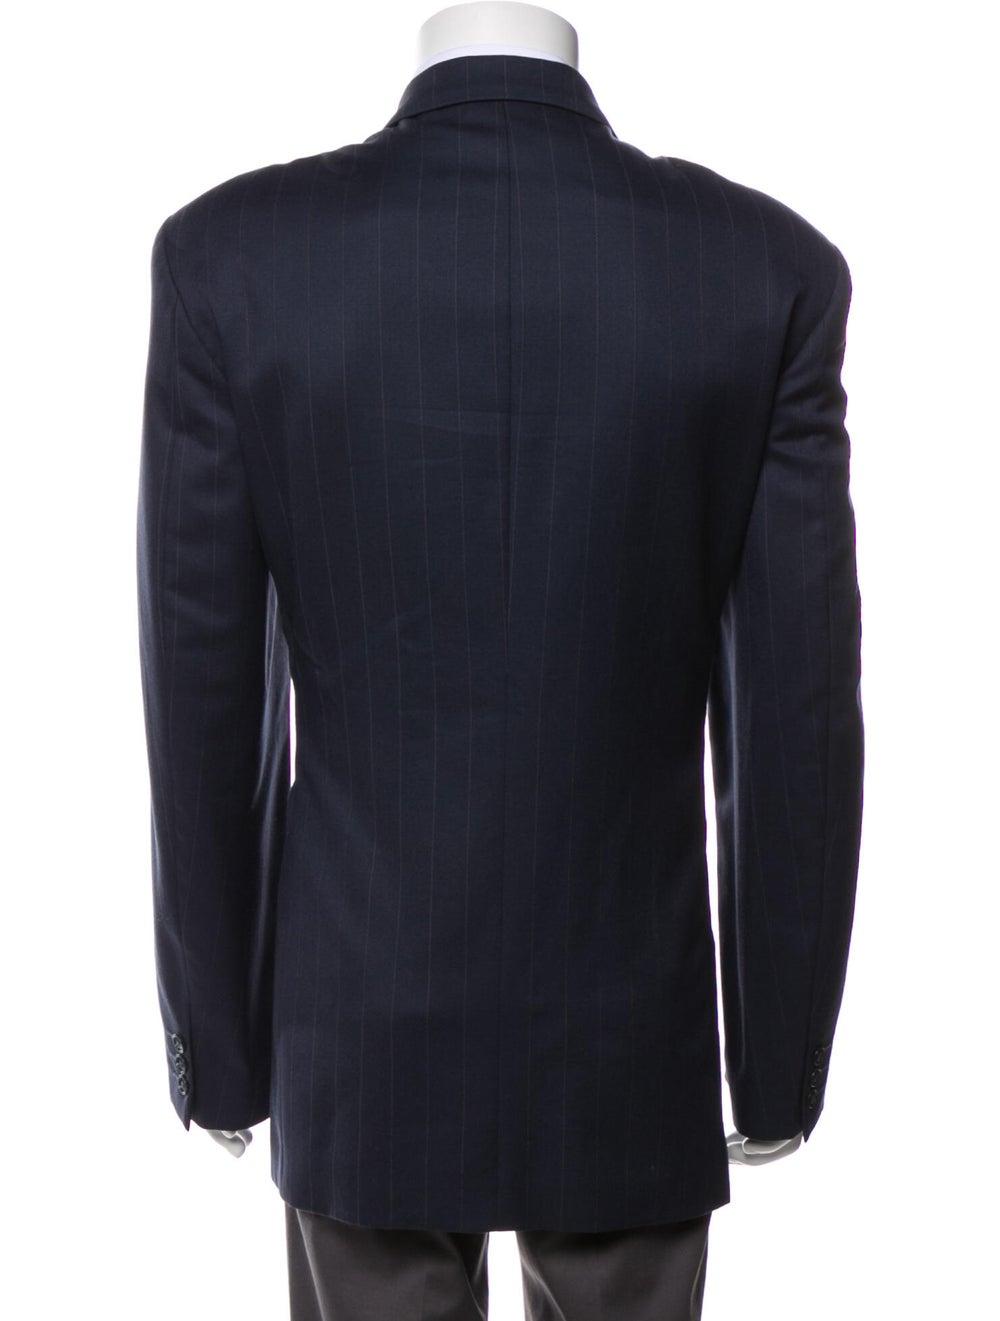 Yves Saint Laurent Vintage Wool Blazer Blue - image 3